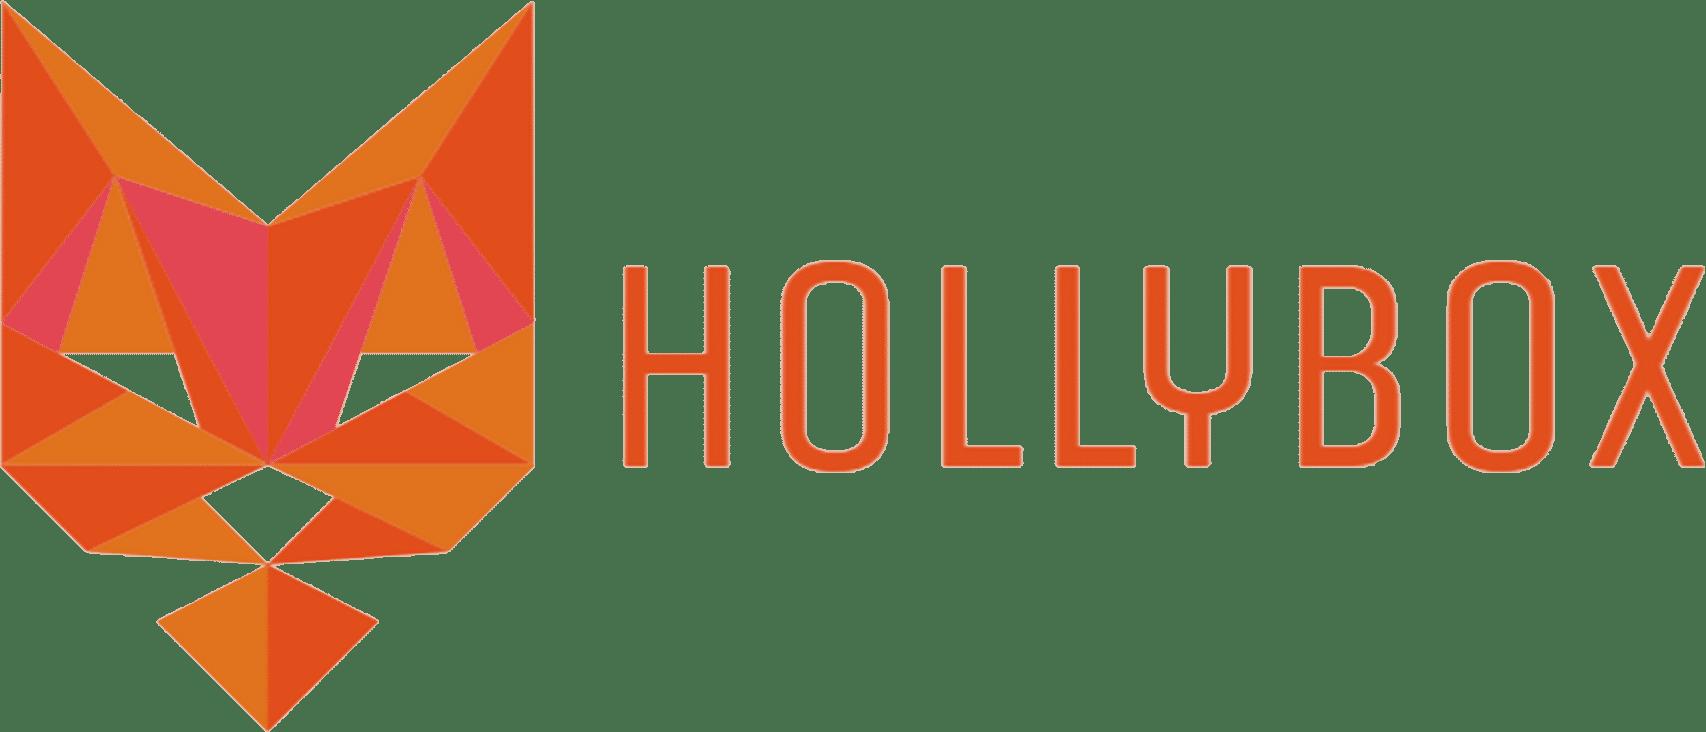 Myhollybox